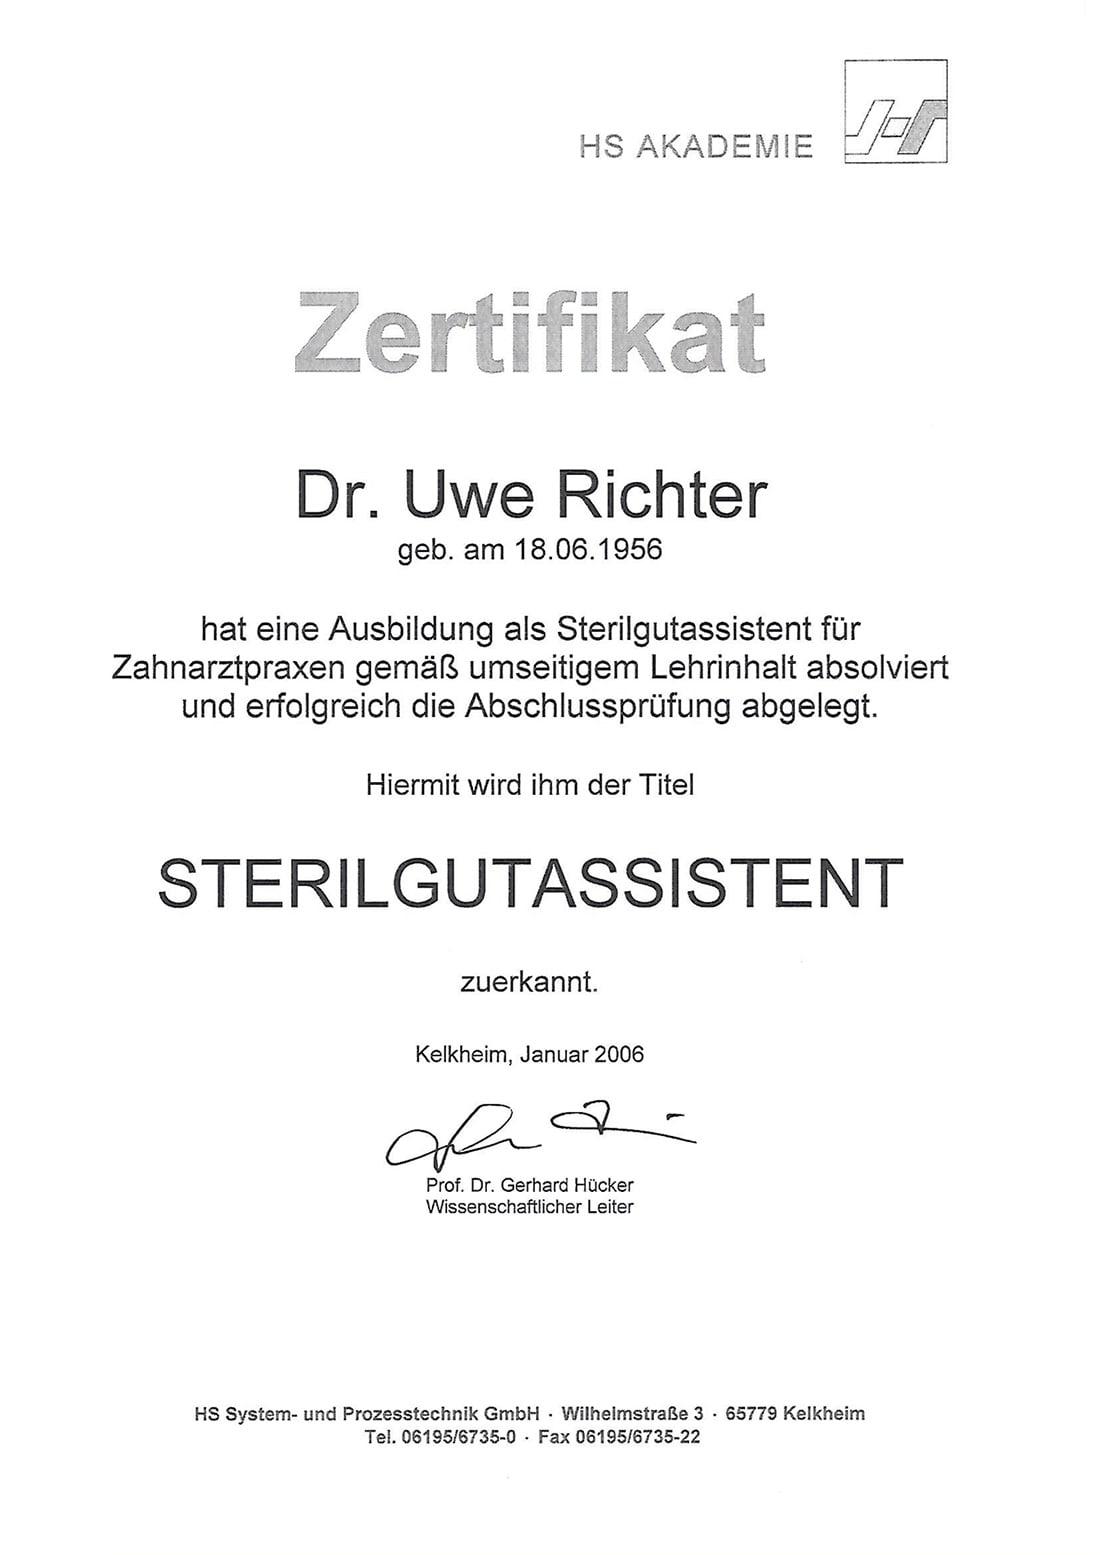 Zertifikat Sterilgutaissistent Dr Richter